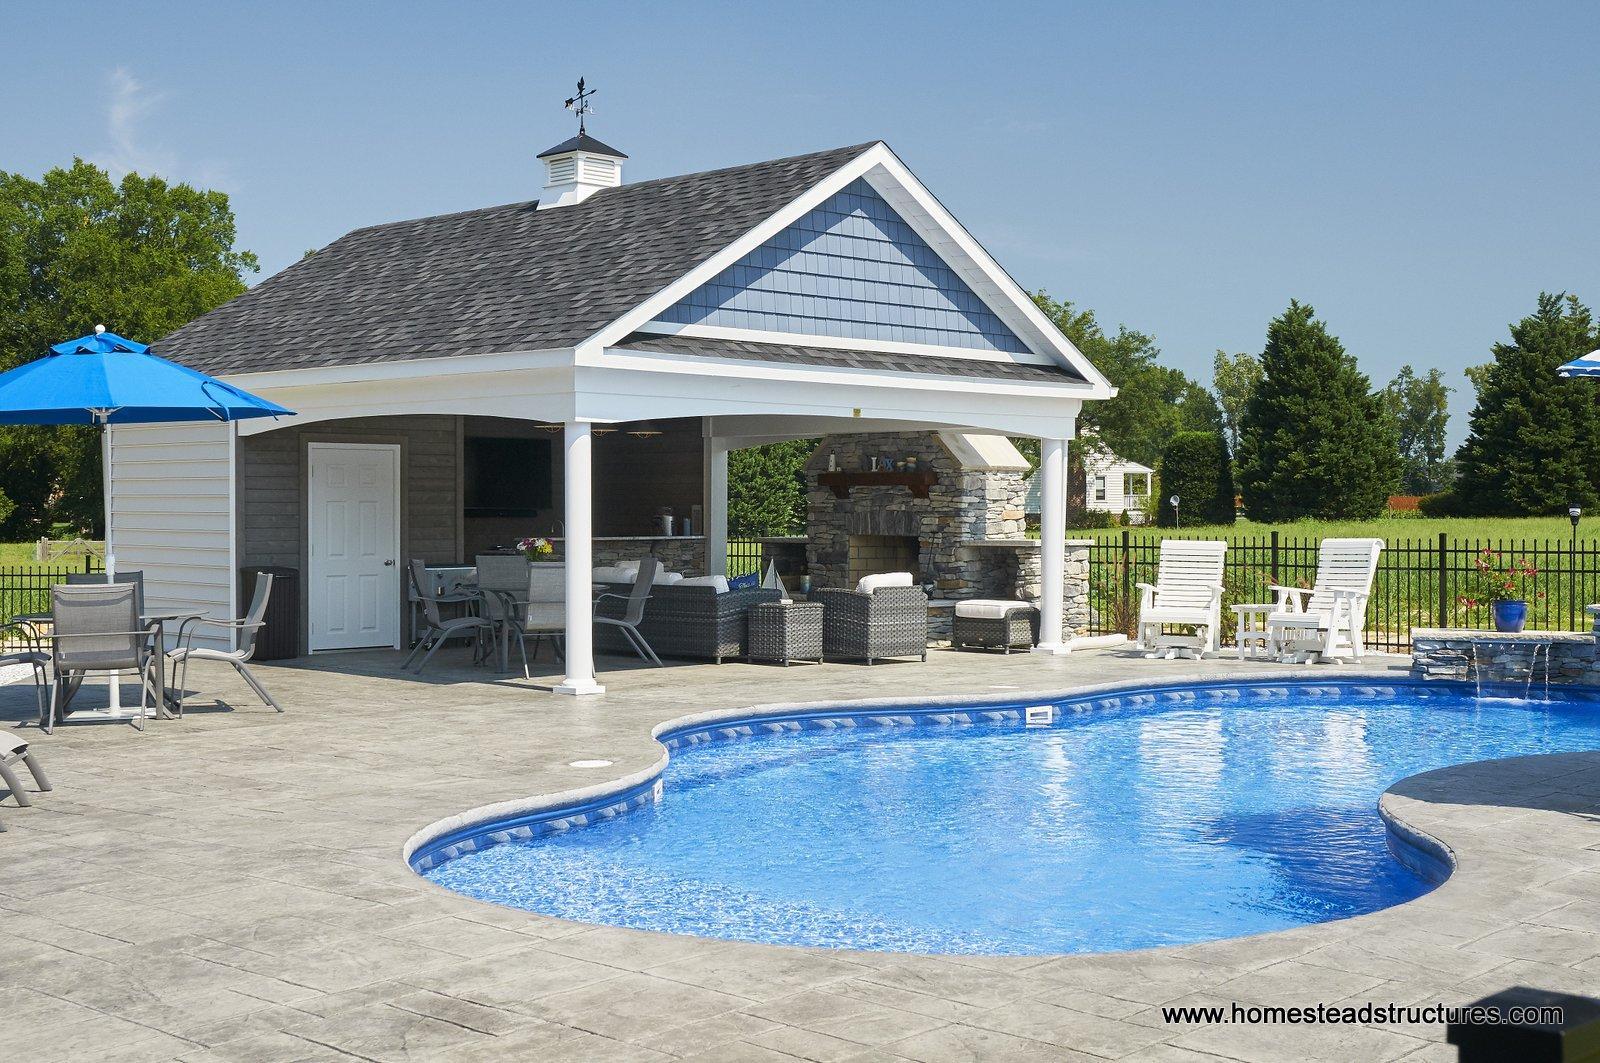 Avalon Pool House Homestead Structures Home Decor Catalogs